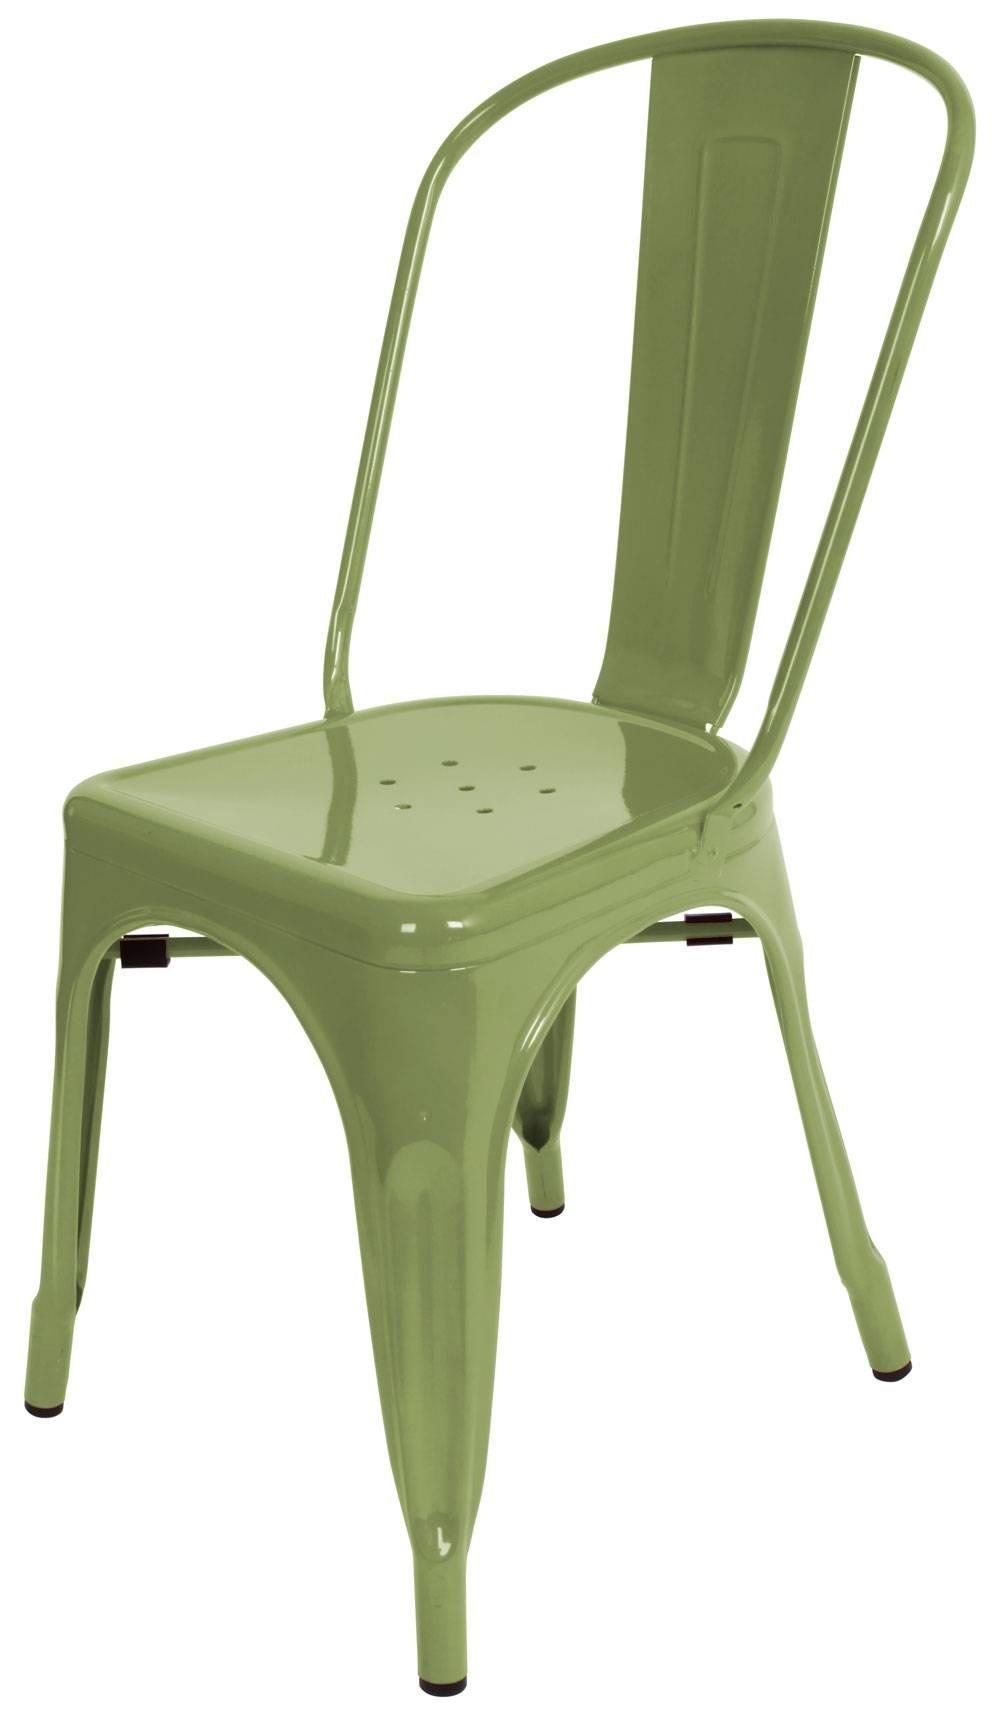 Marais Metal Dining Chair/ Green Marais Tolix Chair /Green Tolix Dining  Metal Chair